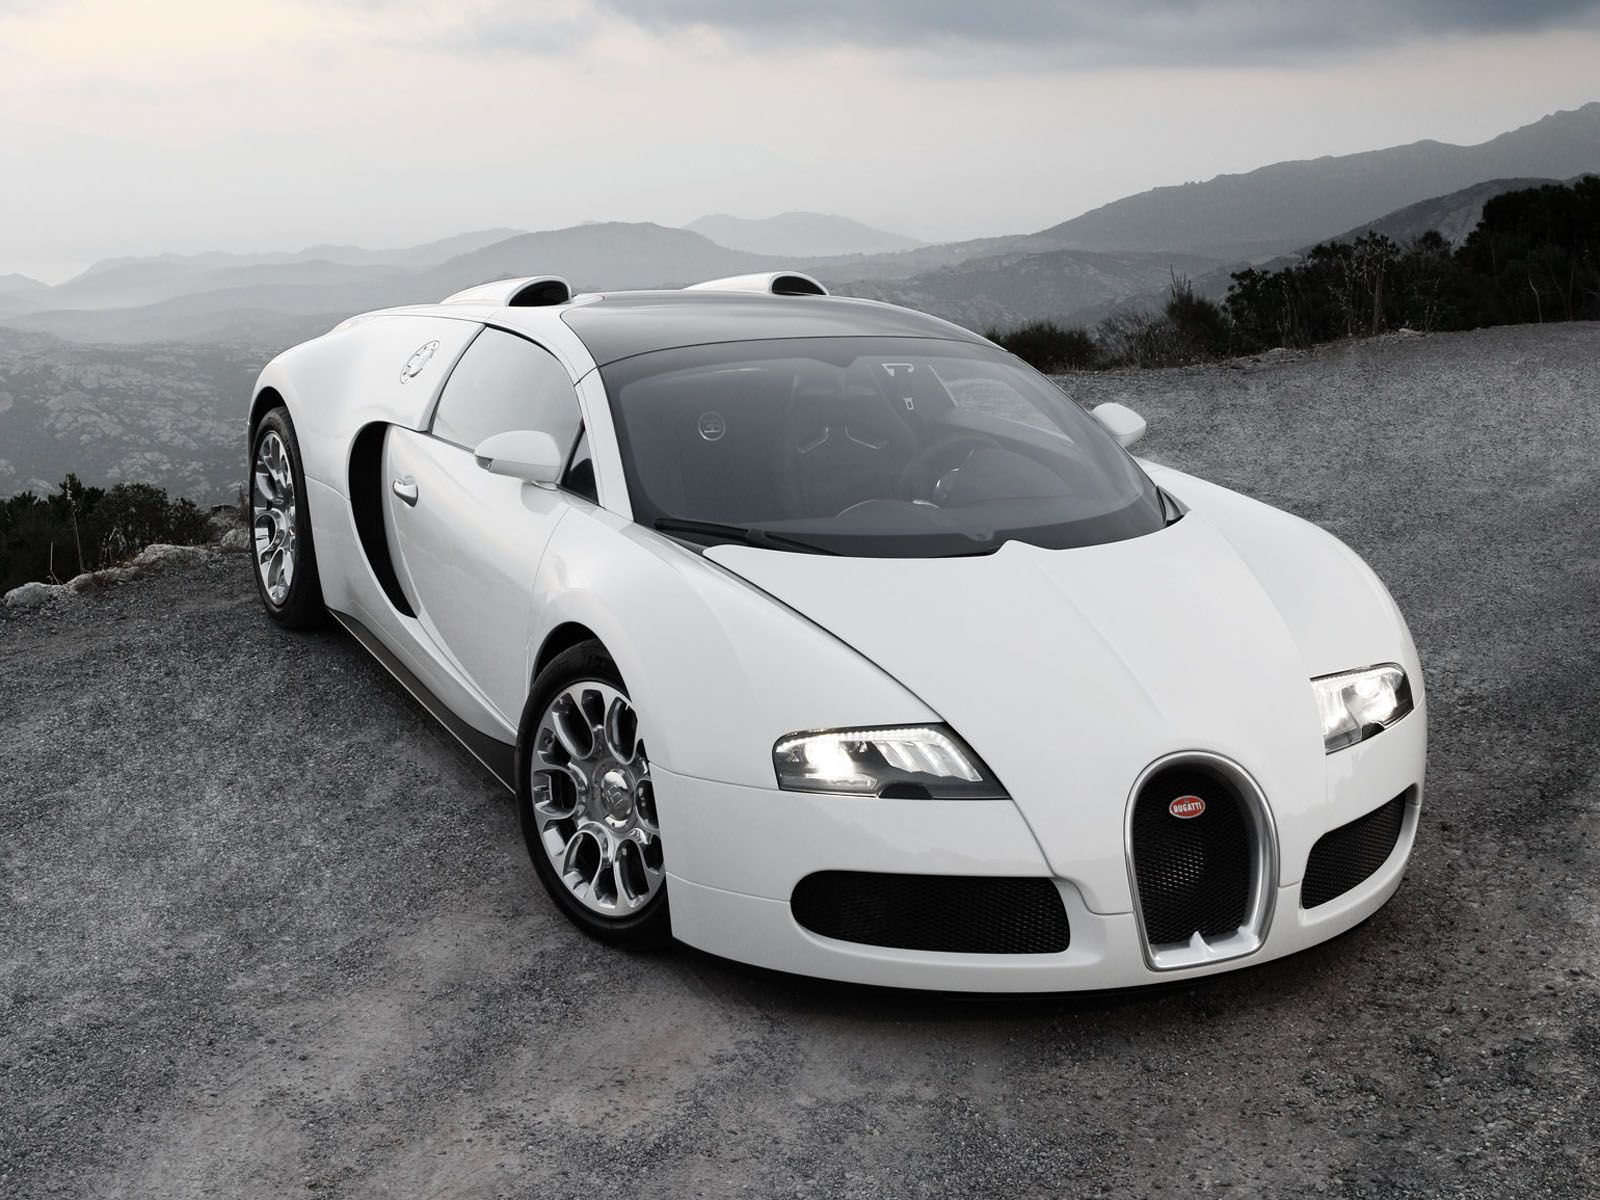 be417d5b0601476aa2dd82ea2f1bba43 Inspiring Bugatti Veyron Quarter Mile Speed Cars Trend